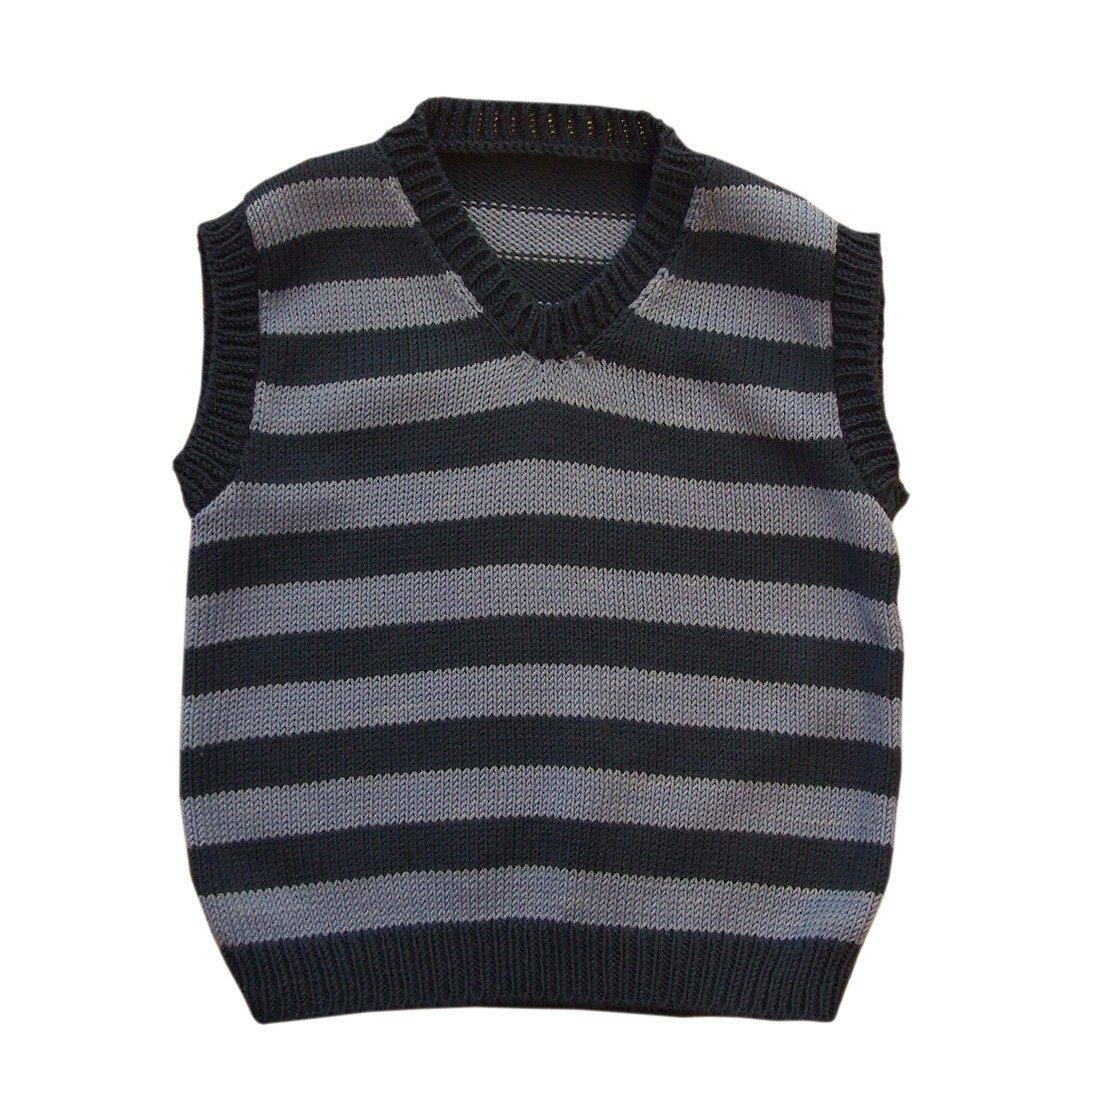 tevirp Girl's Striped Vest 2-3 Years Dark Blue/Sky Blue